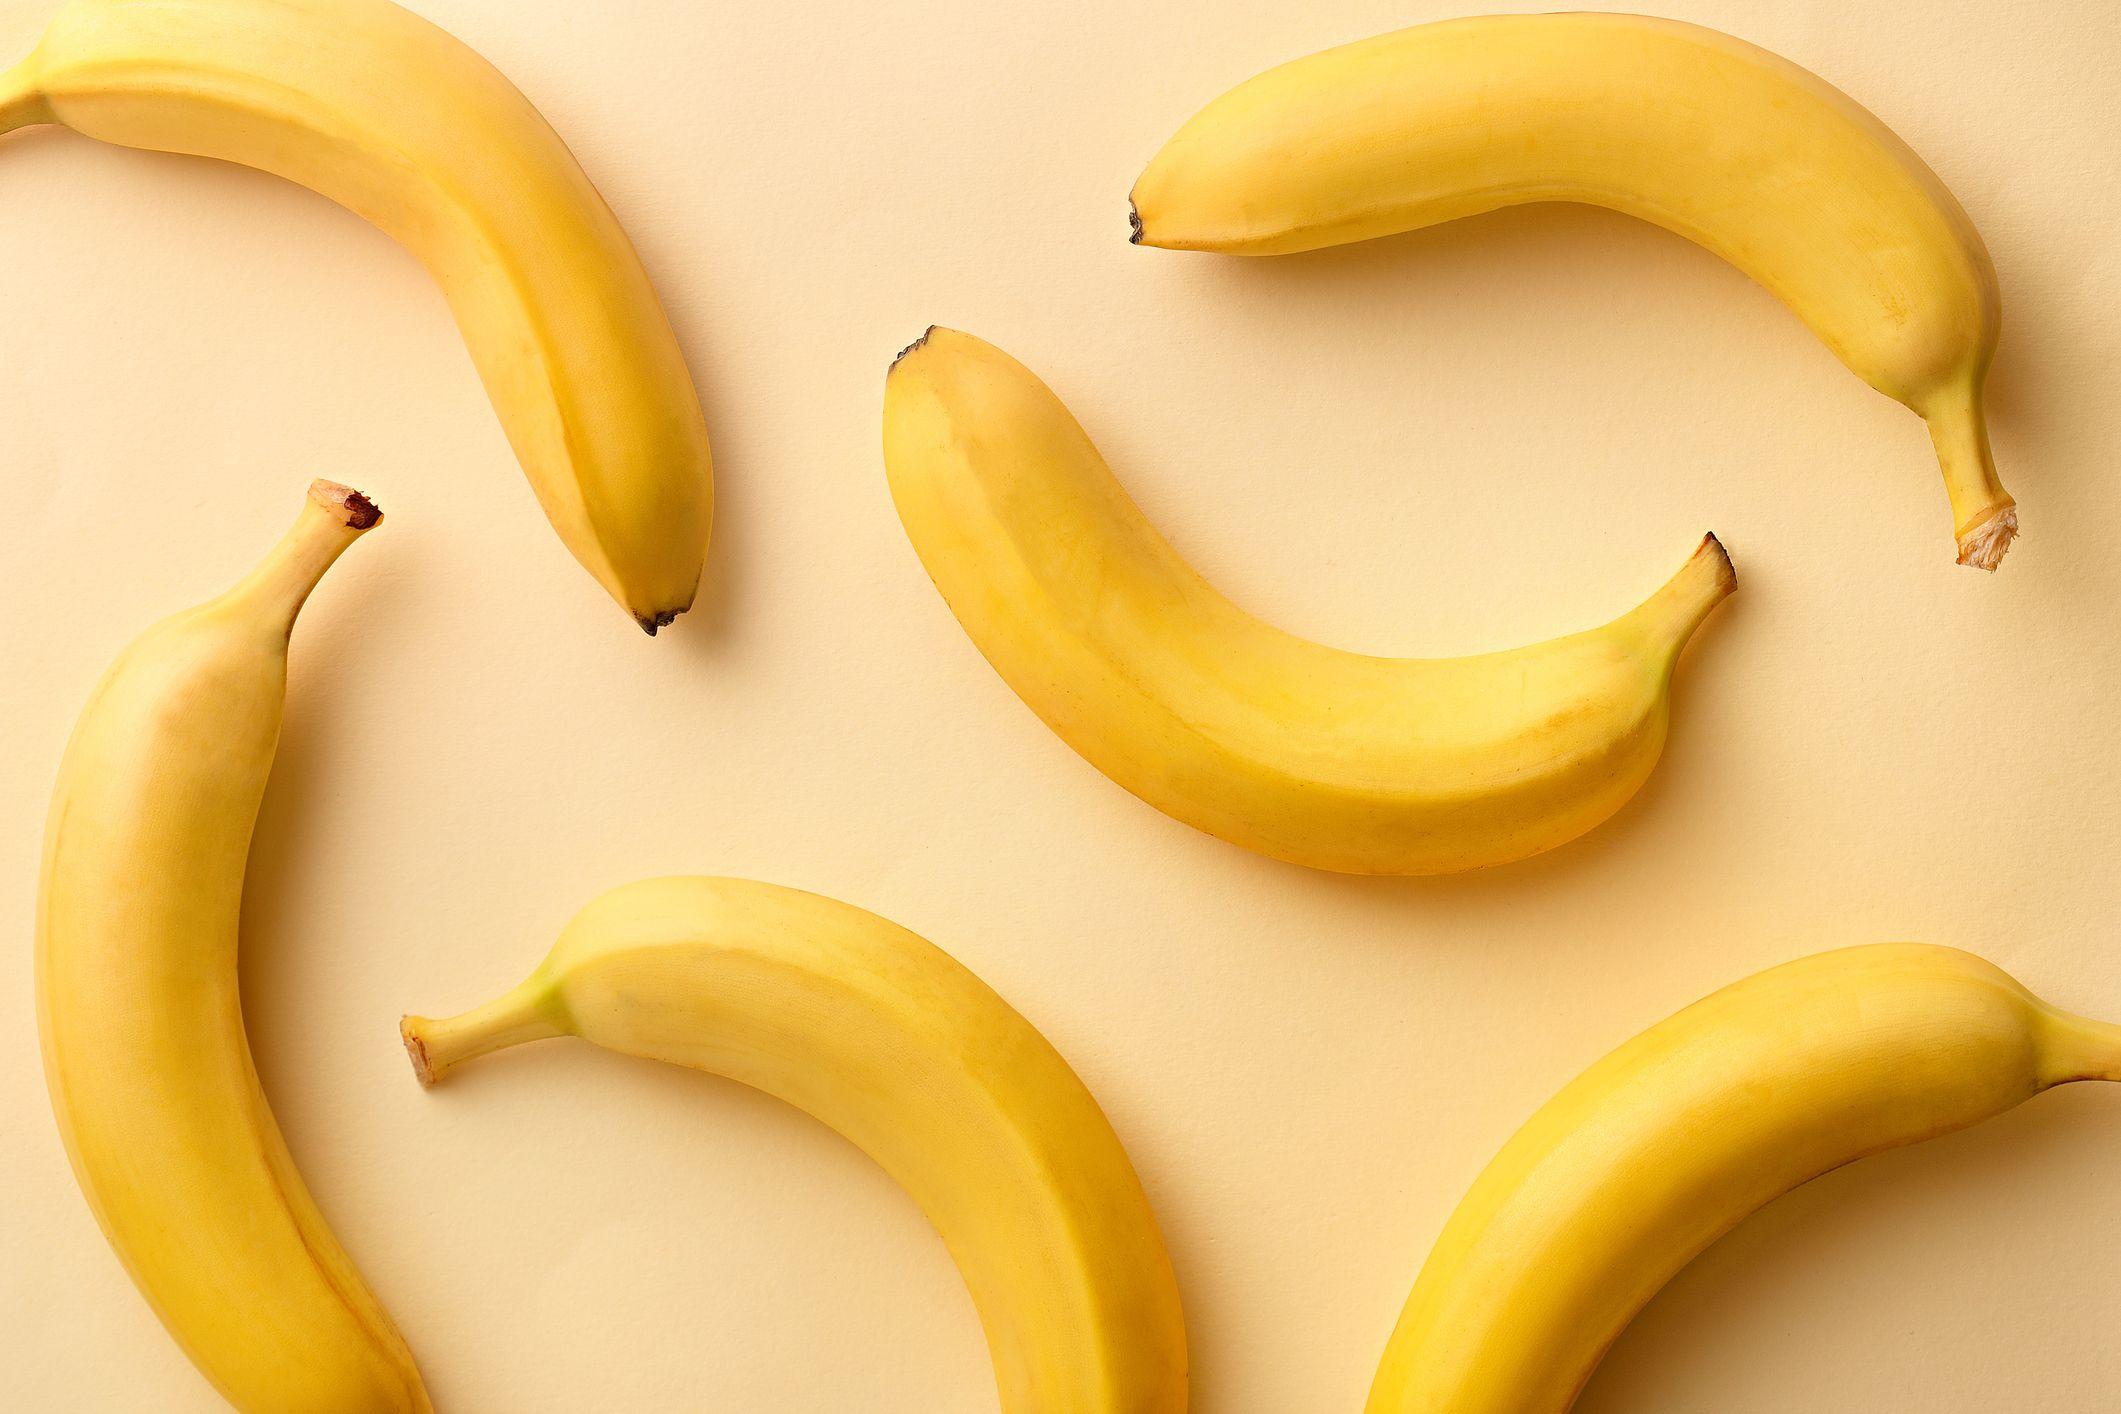 7 reasons why you should be eating the banana peel